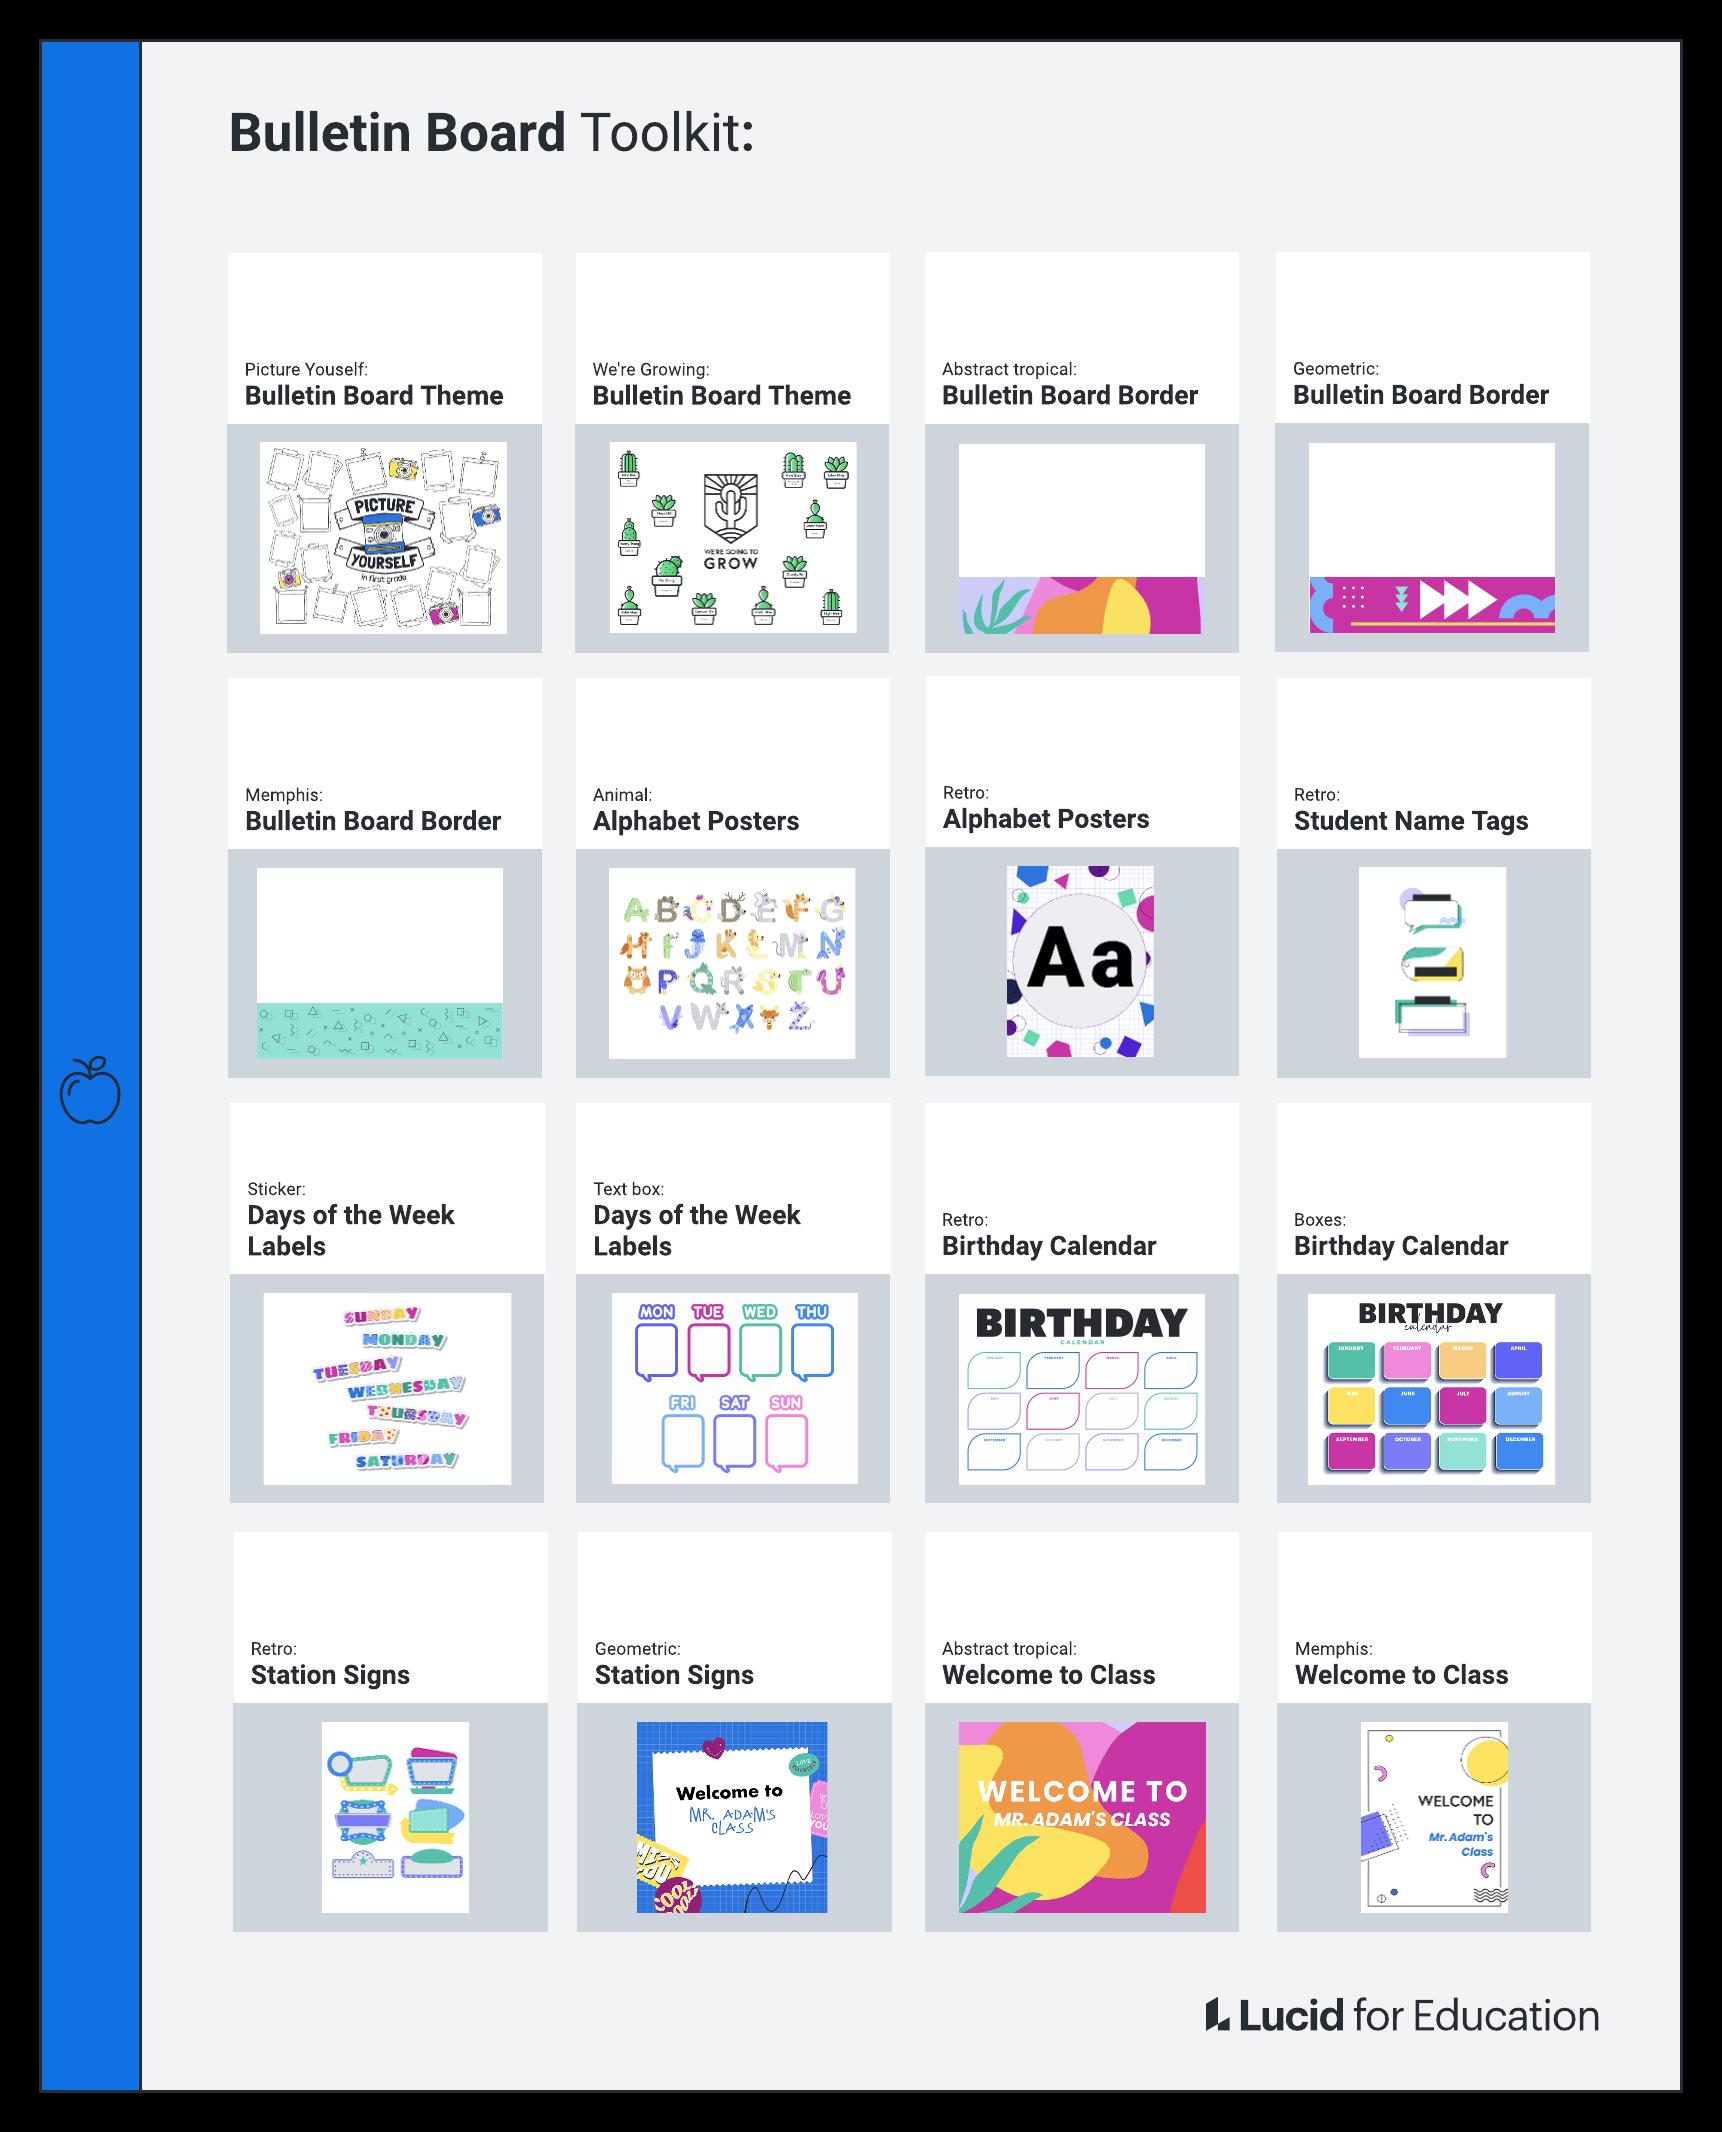 Bulletin board toolkit